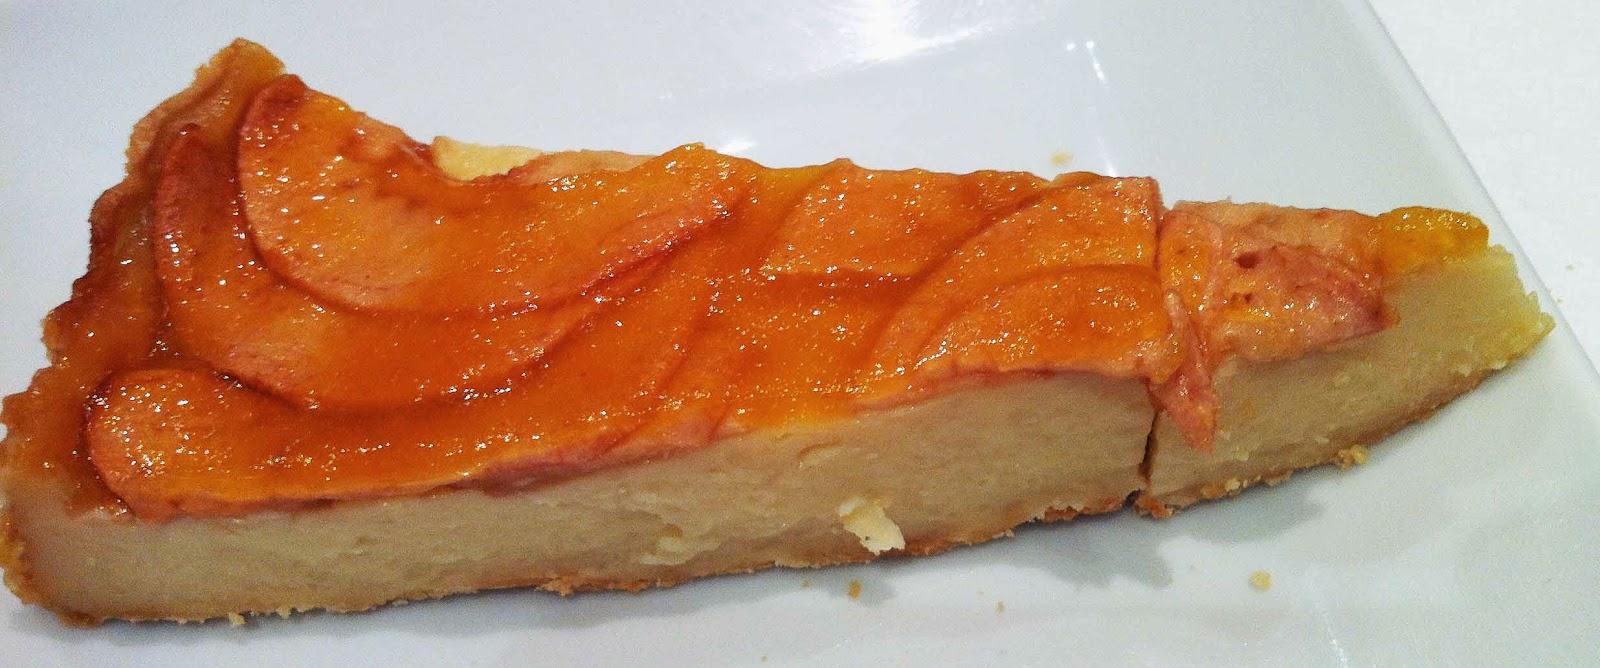 Restaurante-Oncalada-Bilbao-Tarta-Manzana